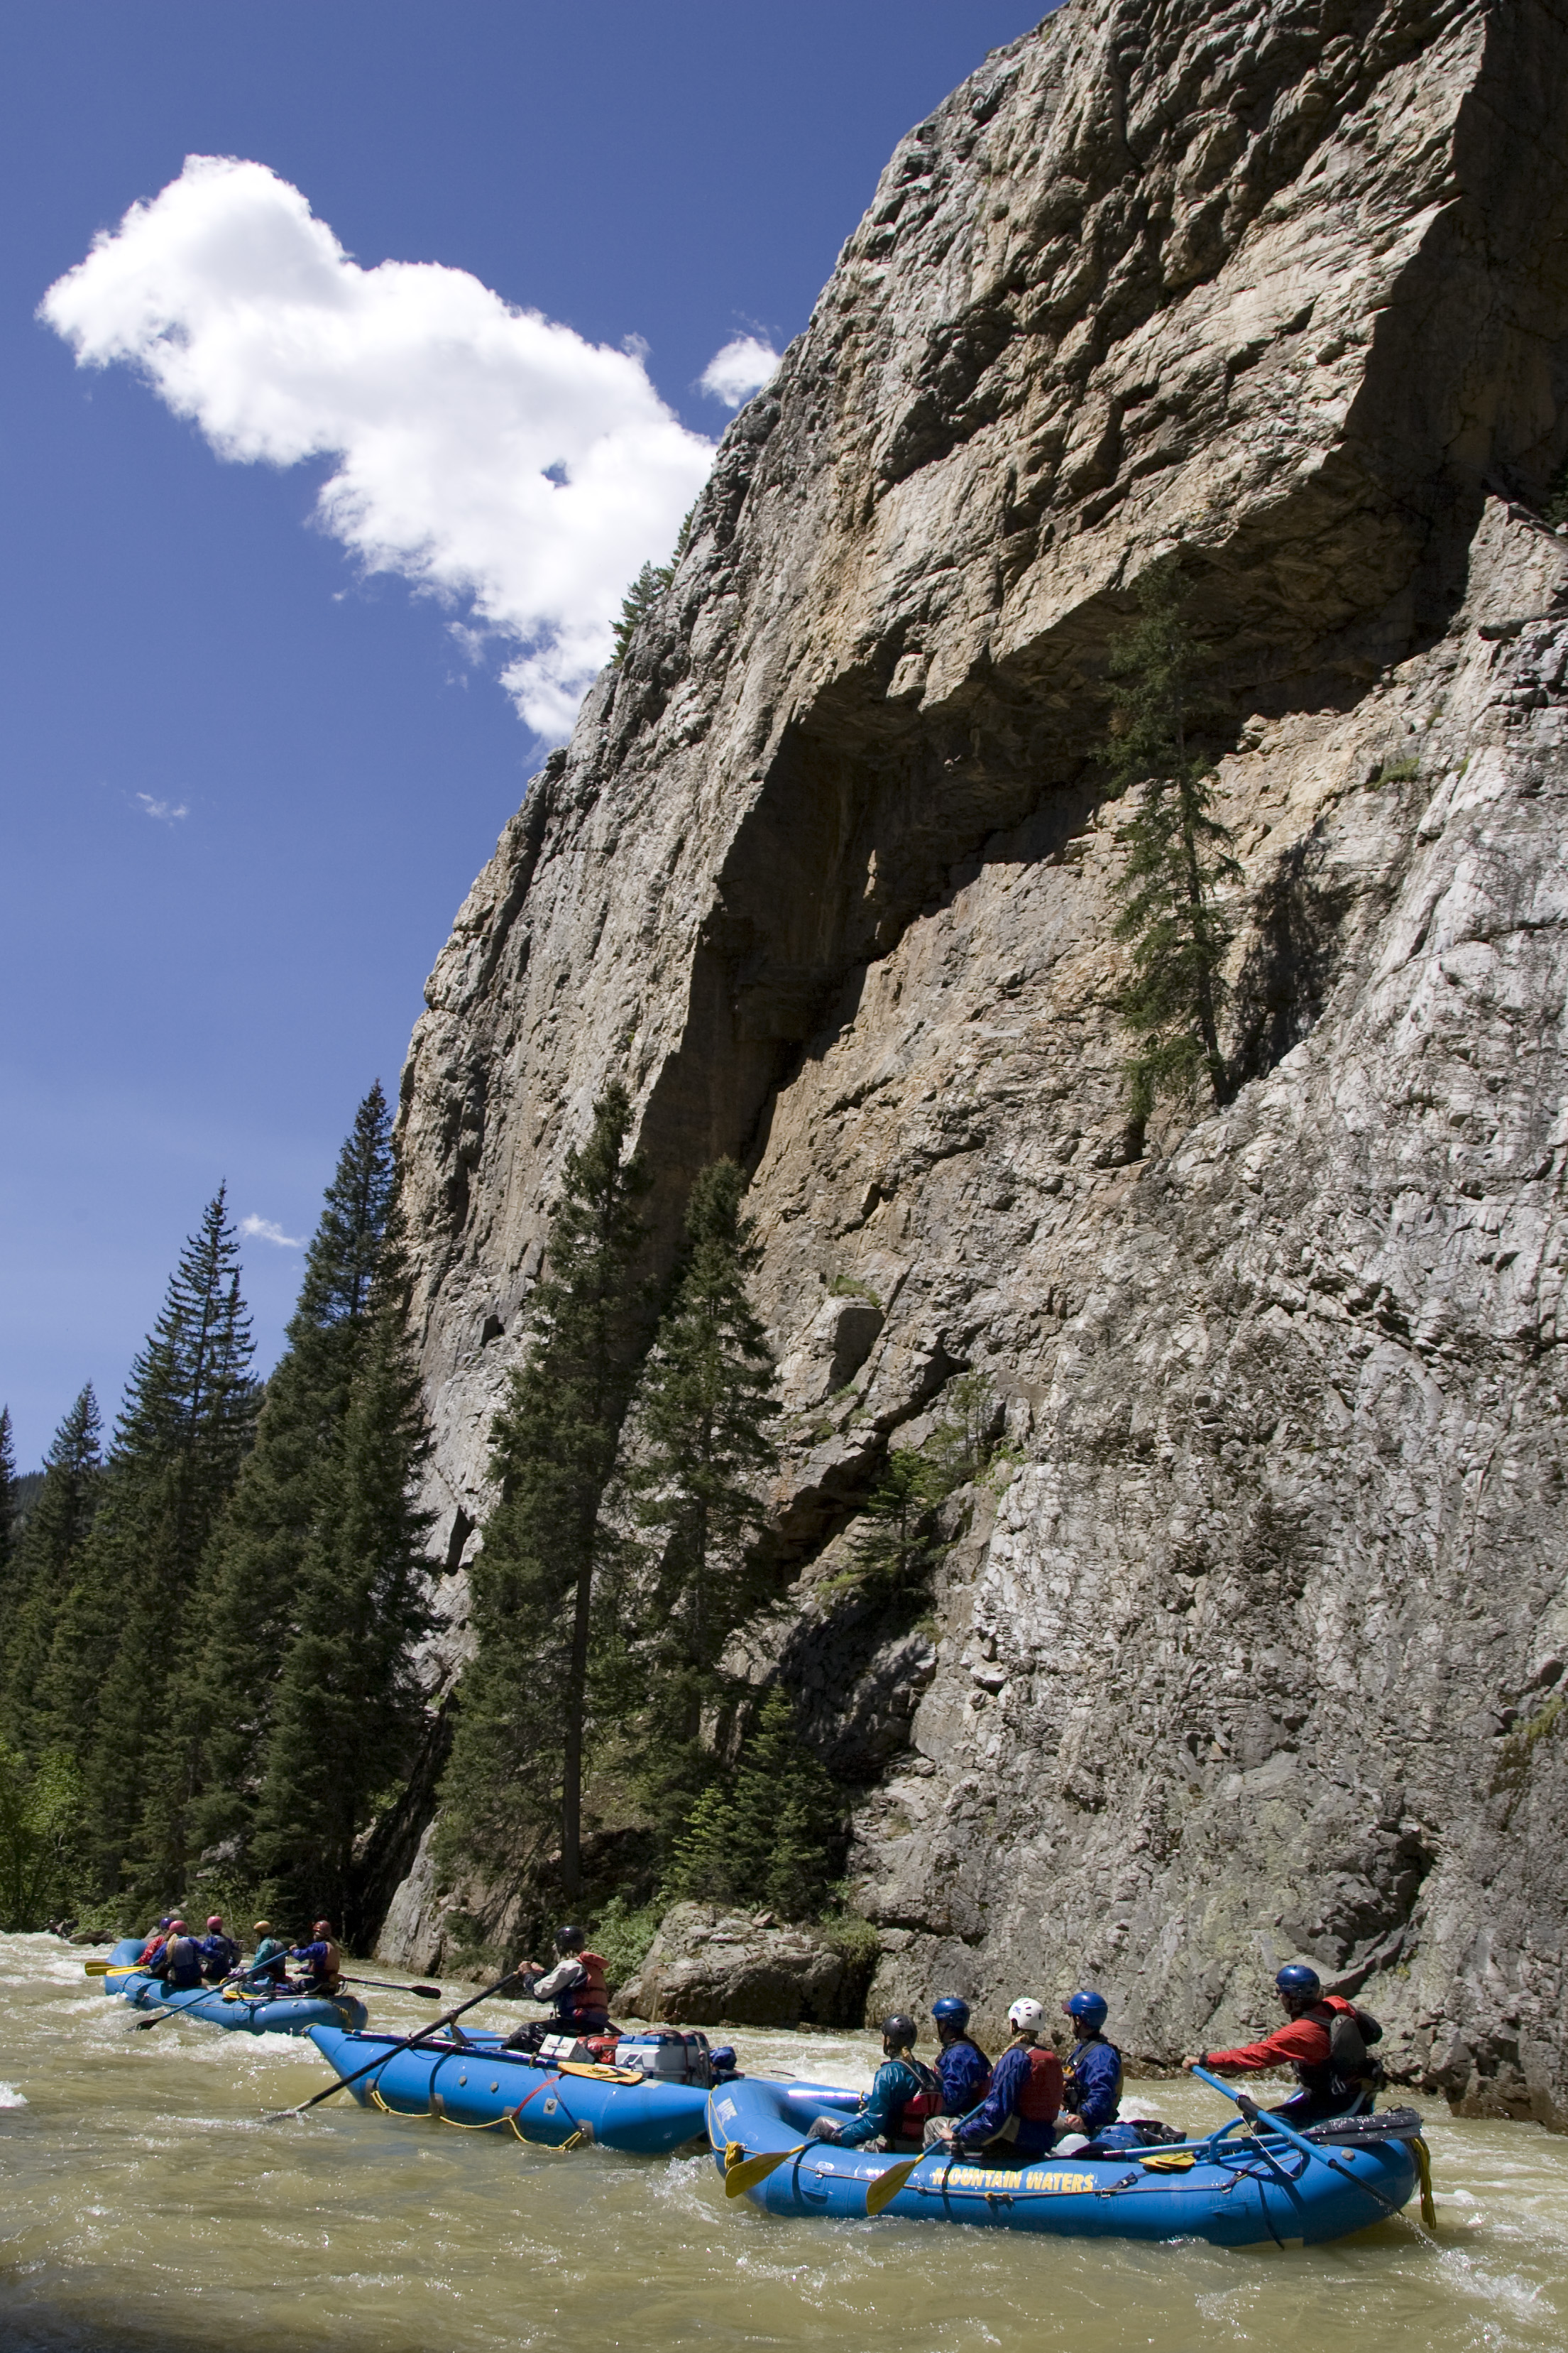 Drive Safe Colorado >> Rock Climbing & Packages   Raft, Mesa Verde, Train, 4x4 Tours, Zip Line, Bicycles, SUP